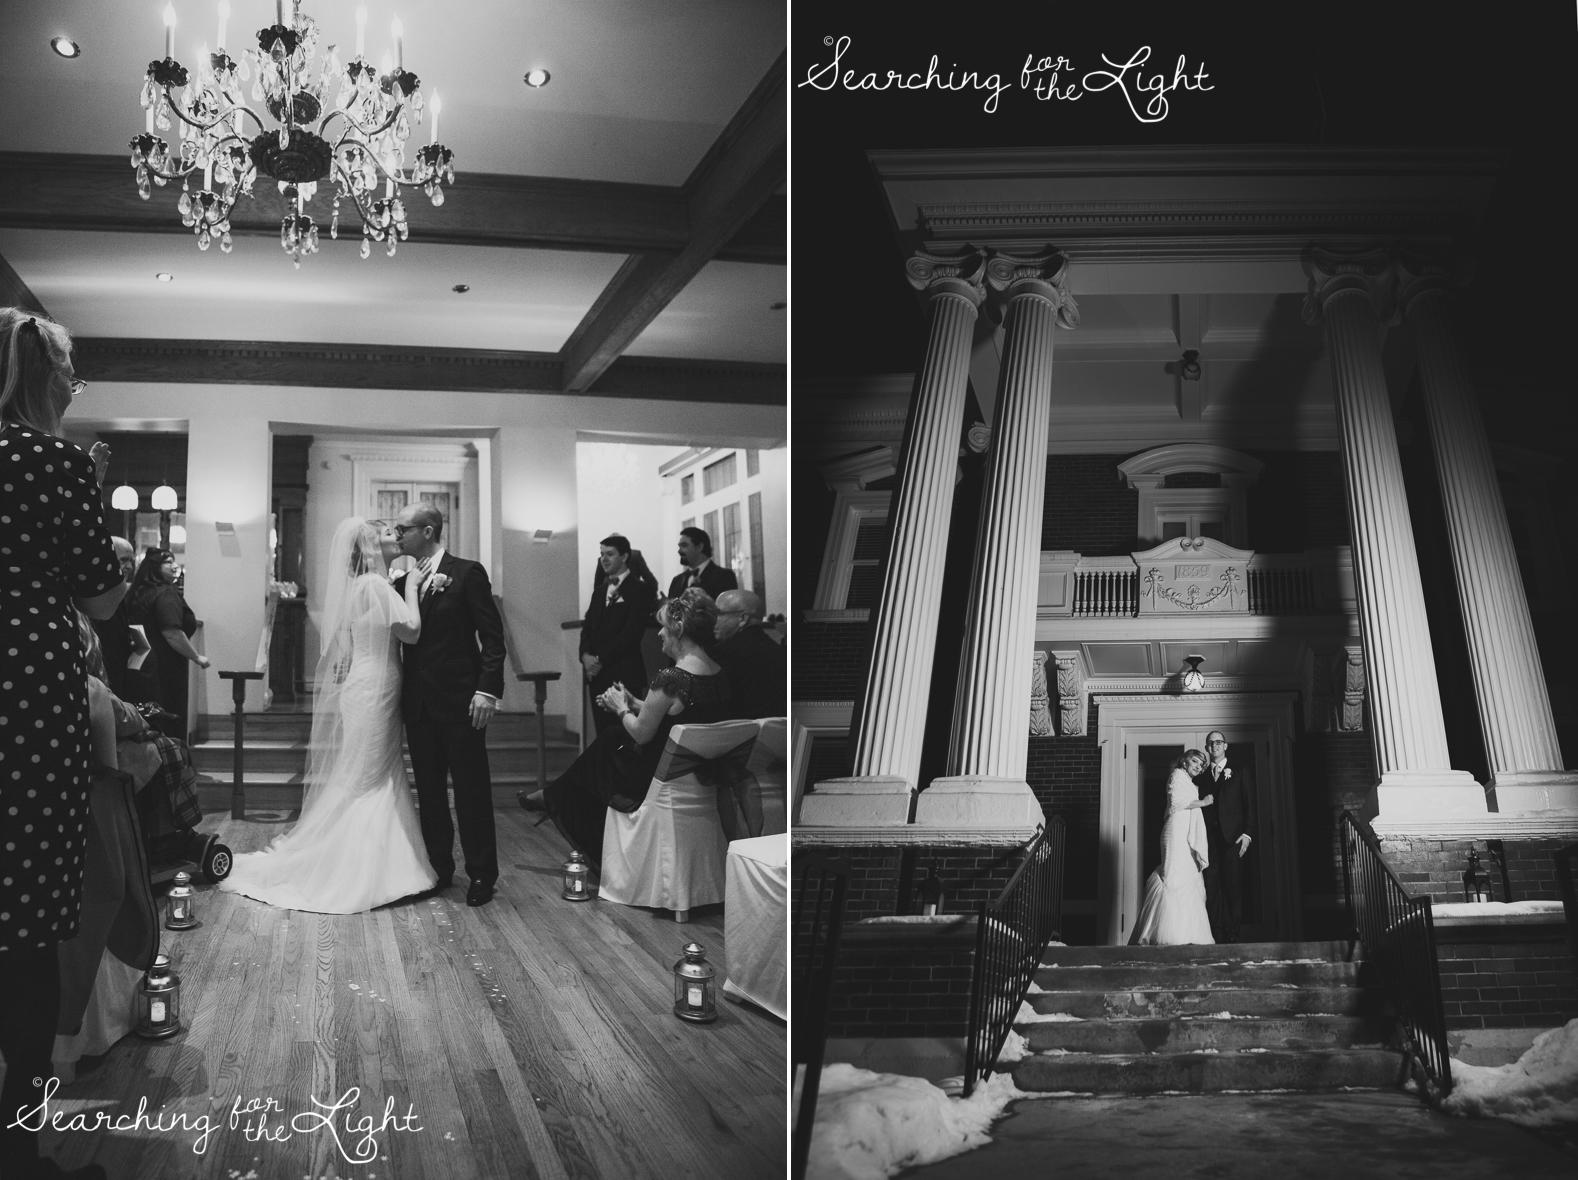 Parkside mansion wedding photo by denver wedding photographer, romantic evening wedding photo, city wedding